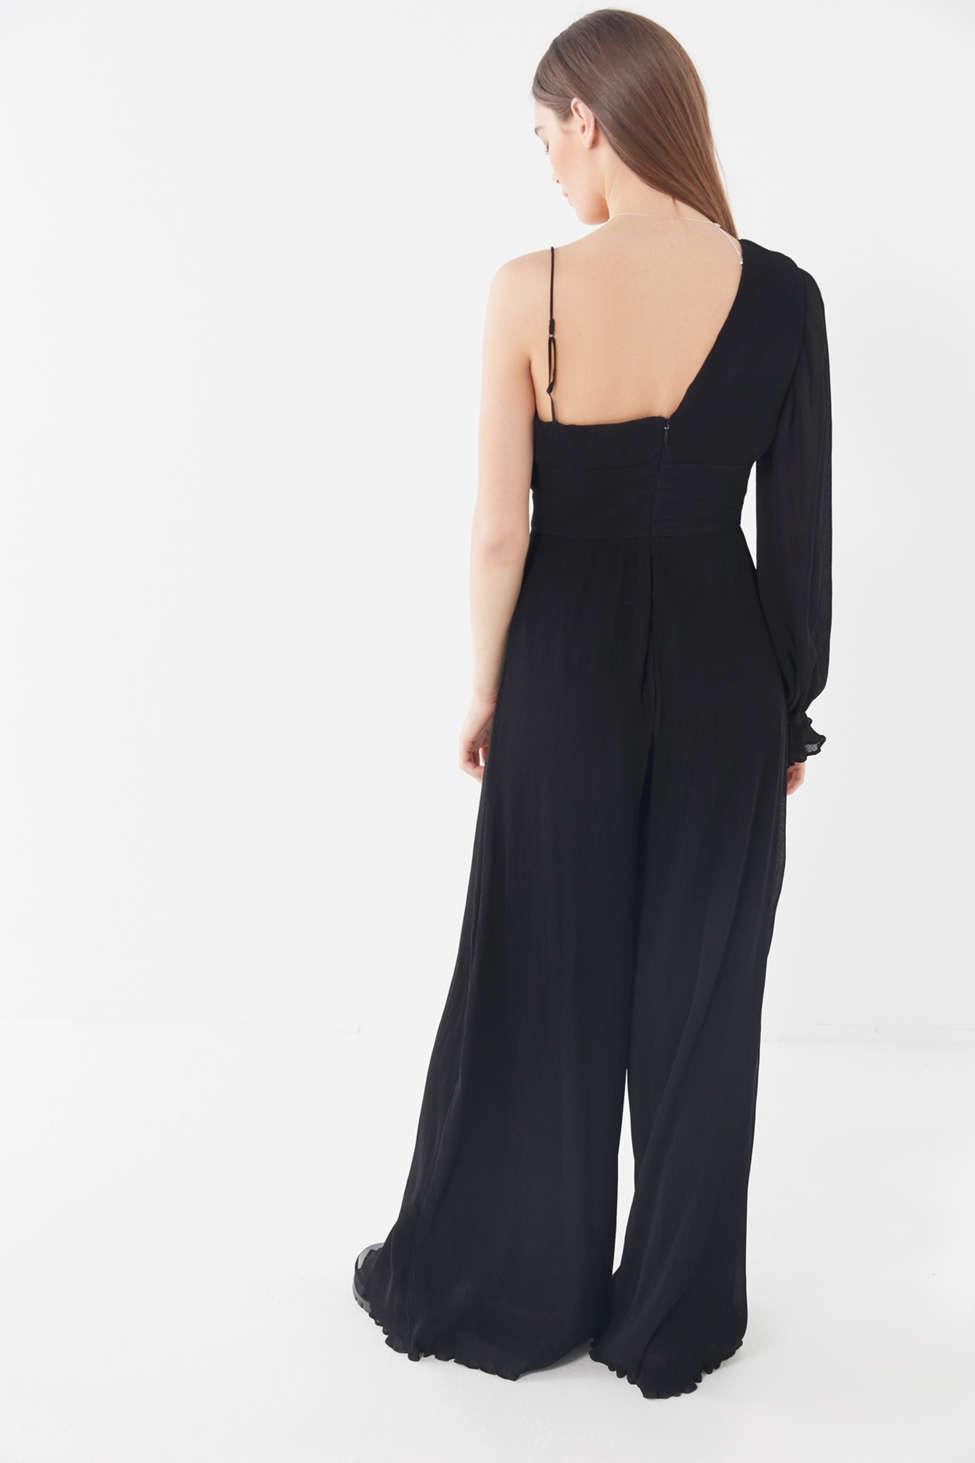 99c9e027eb79 Lyst - Keepsake Clarity One-shoulder Wide Leg Jumpsuit in Black